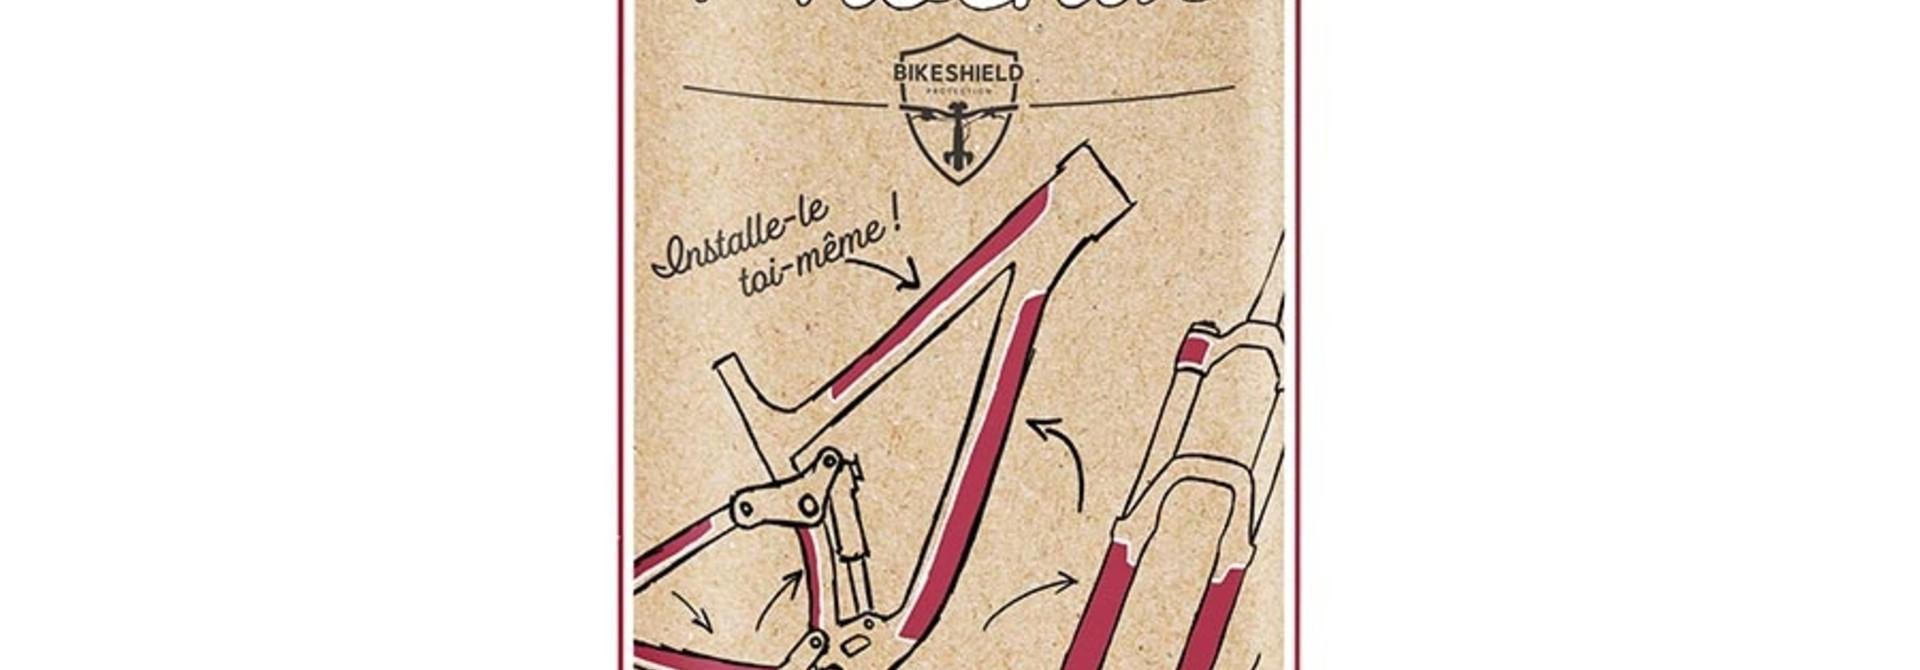 Bikeshield Protection - Pheonix